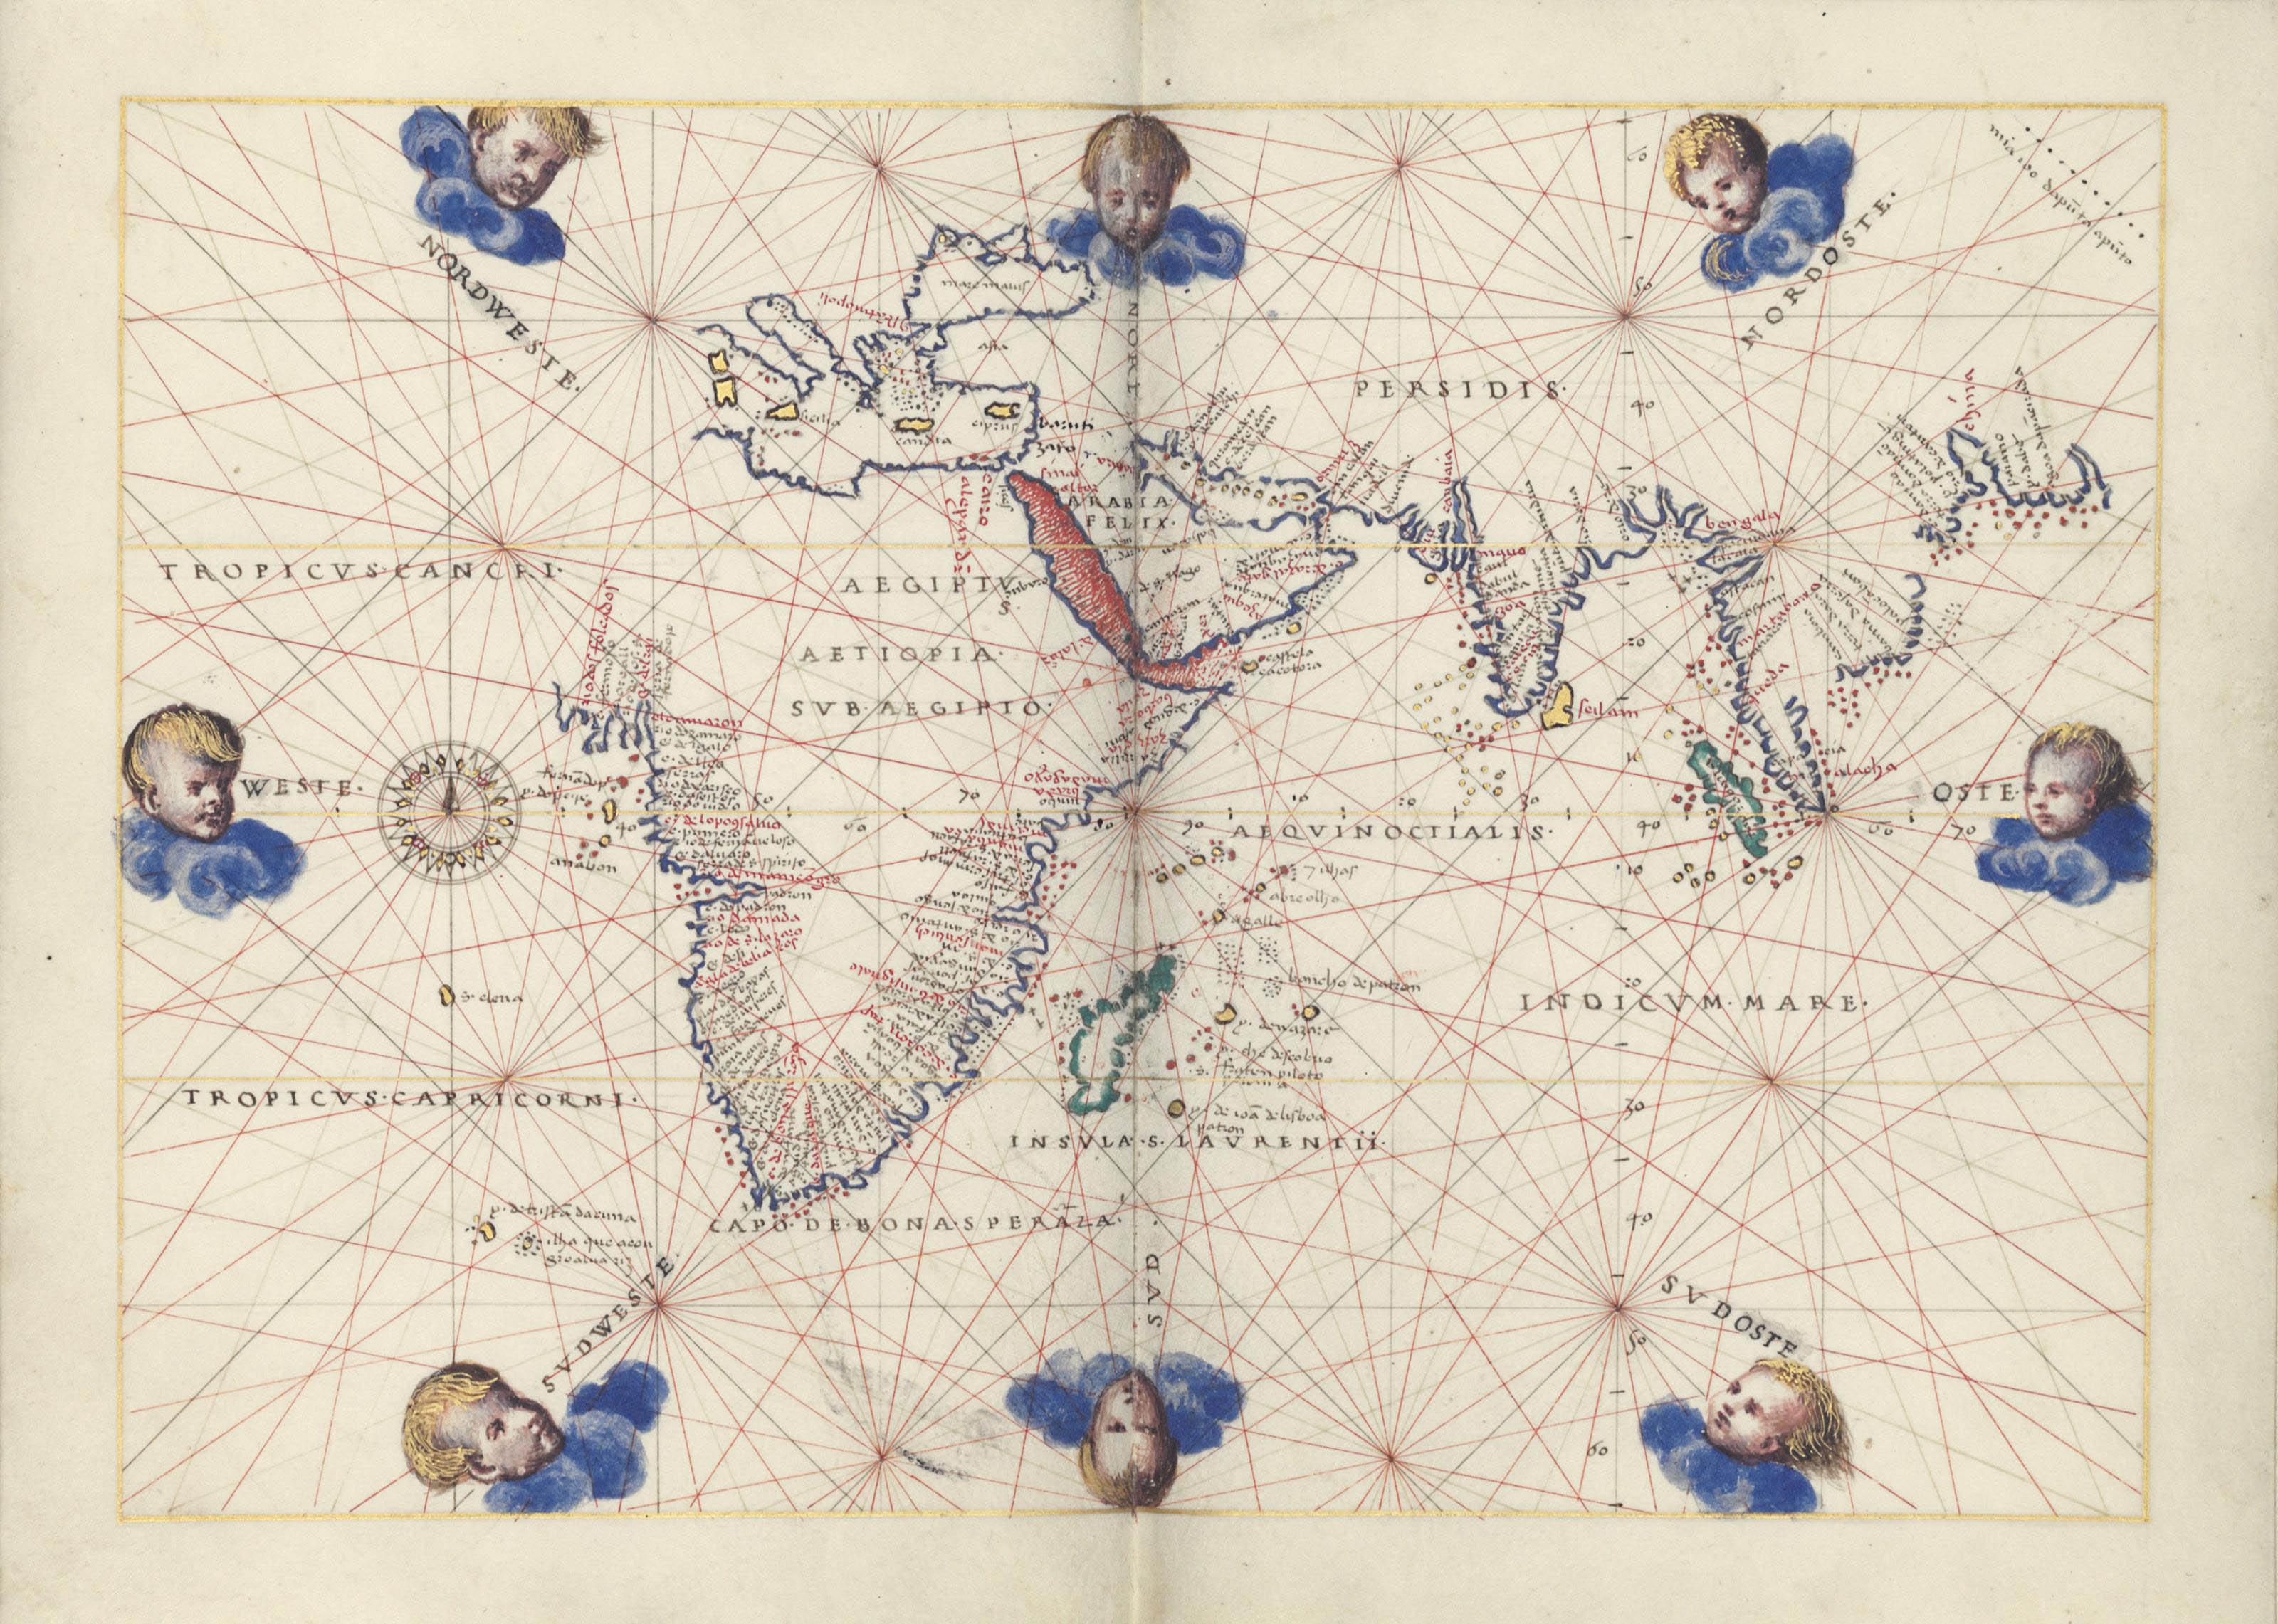 [AGNESE, Battista (c. 1500-1564)]. Portolan atlas of the world. ILLUMINATED MANUSCRIPT ON VELLUM. [Venice, c. 1542-46].